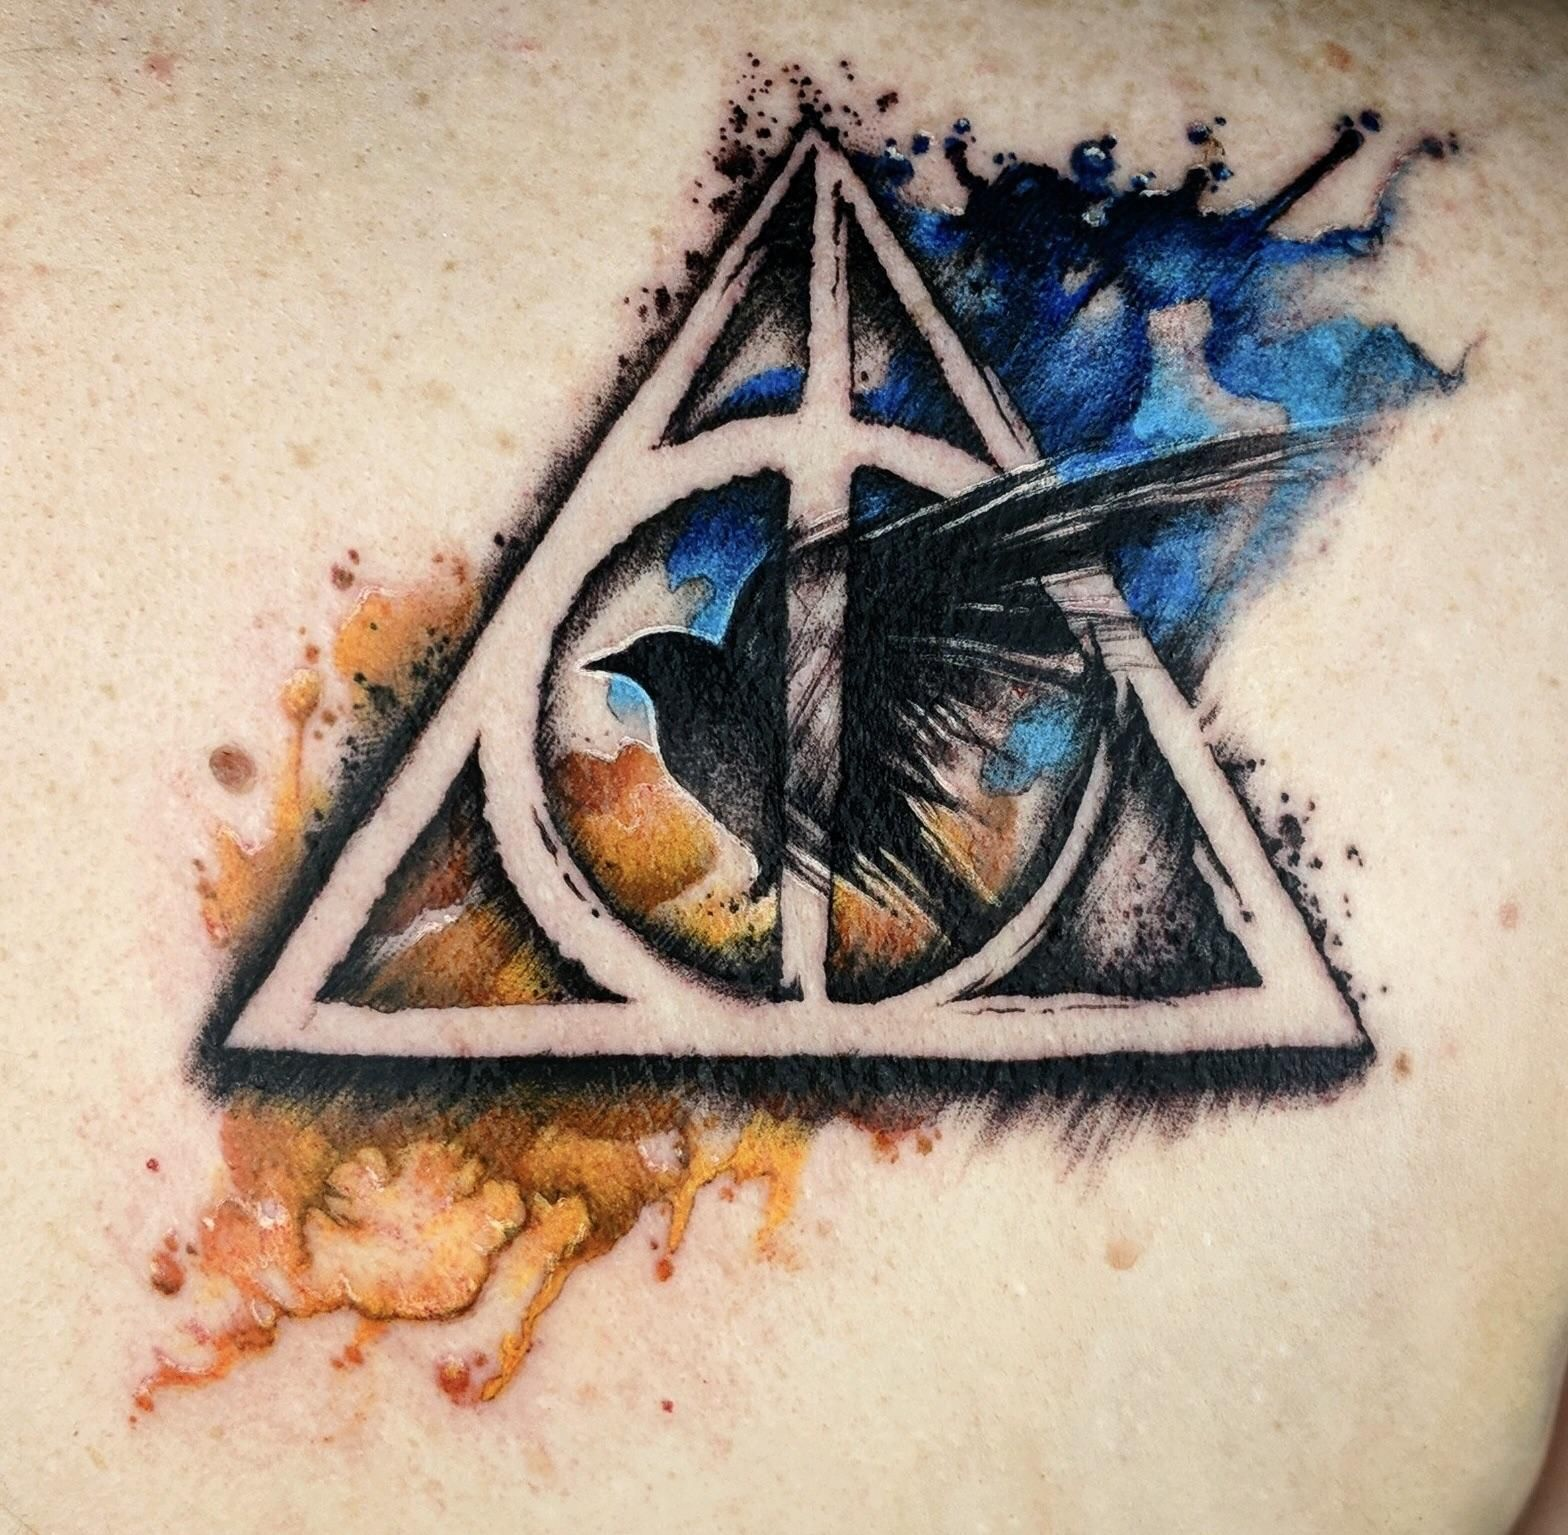 Ravenclaw Themed Deathly Hallows By Cat At Madd Tatterz In Riverside Ca Harrypot Harry Potter Tattoos Heiligtumer Des Todes Harry Potter Bildschirmhintergrund